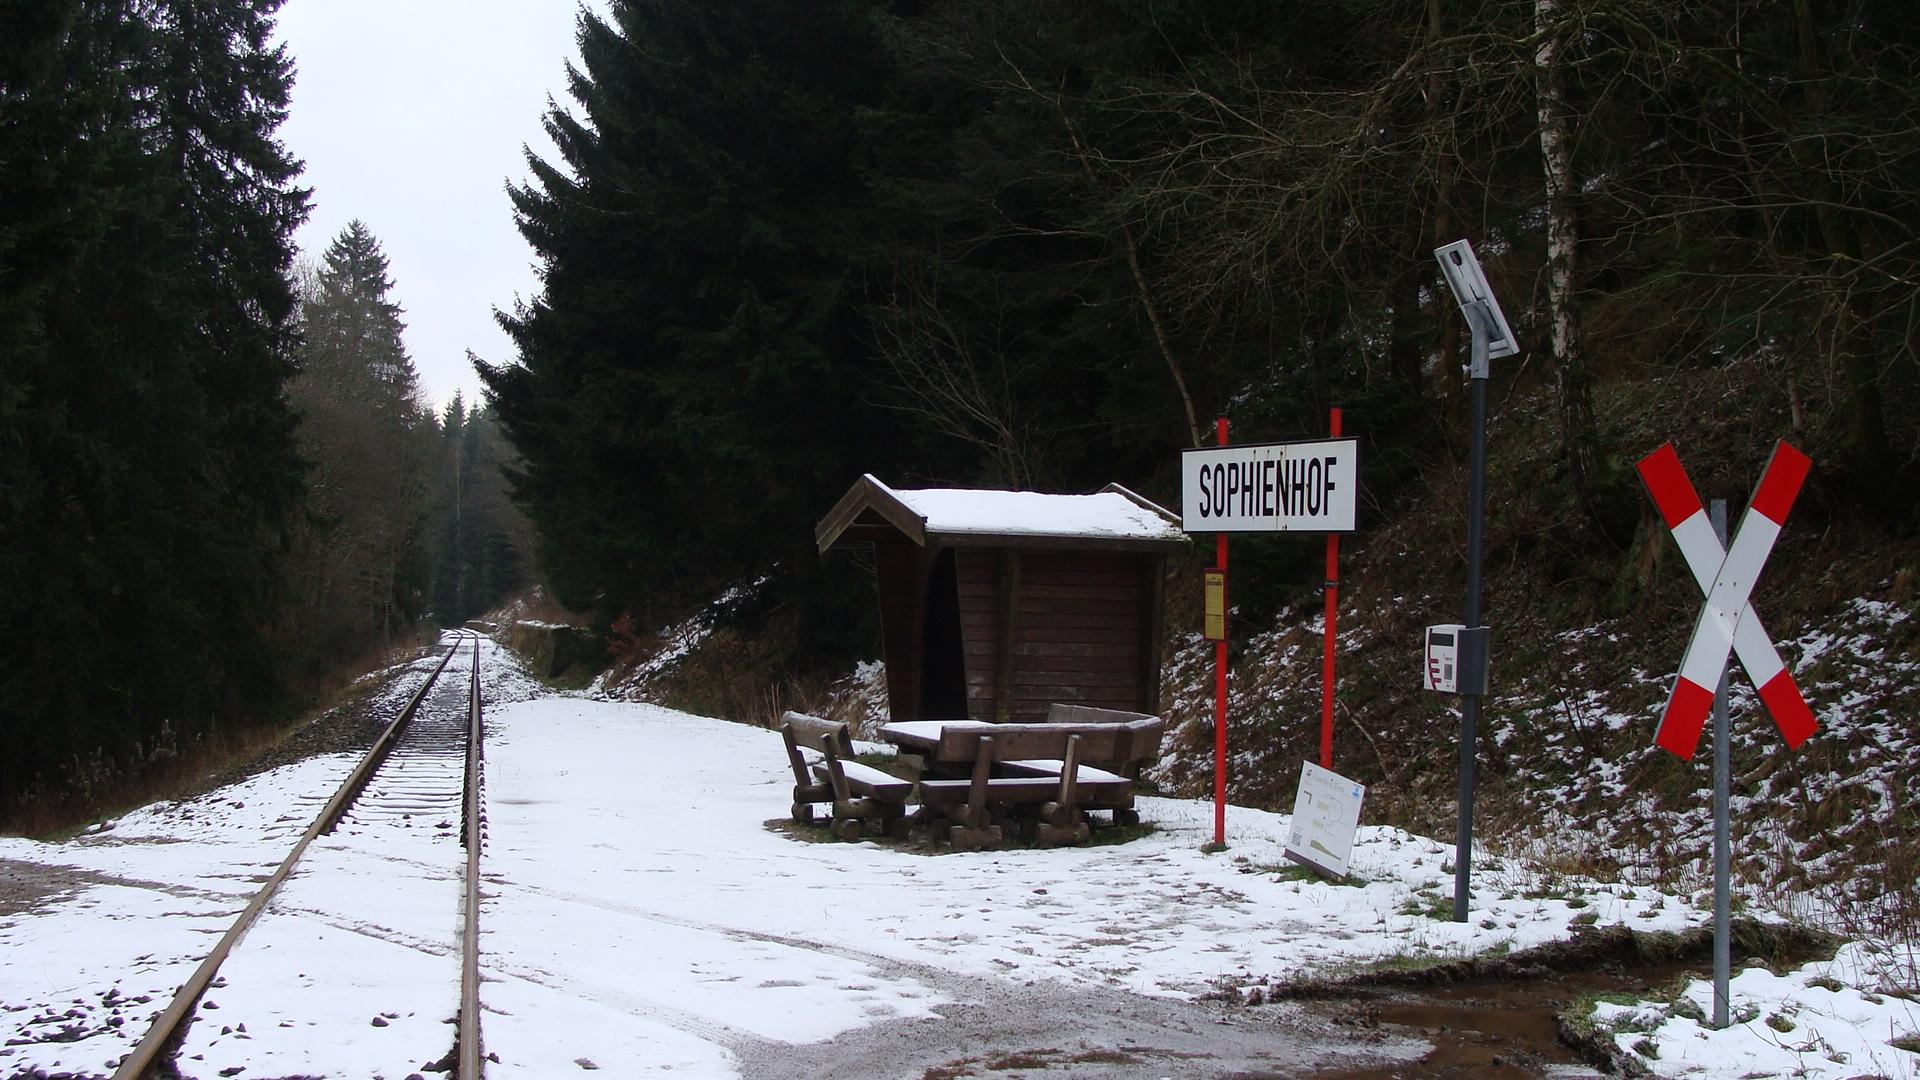 HSB Bahnhof Sophienhof